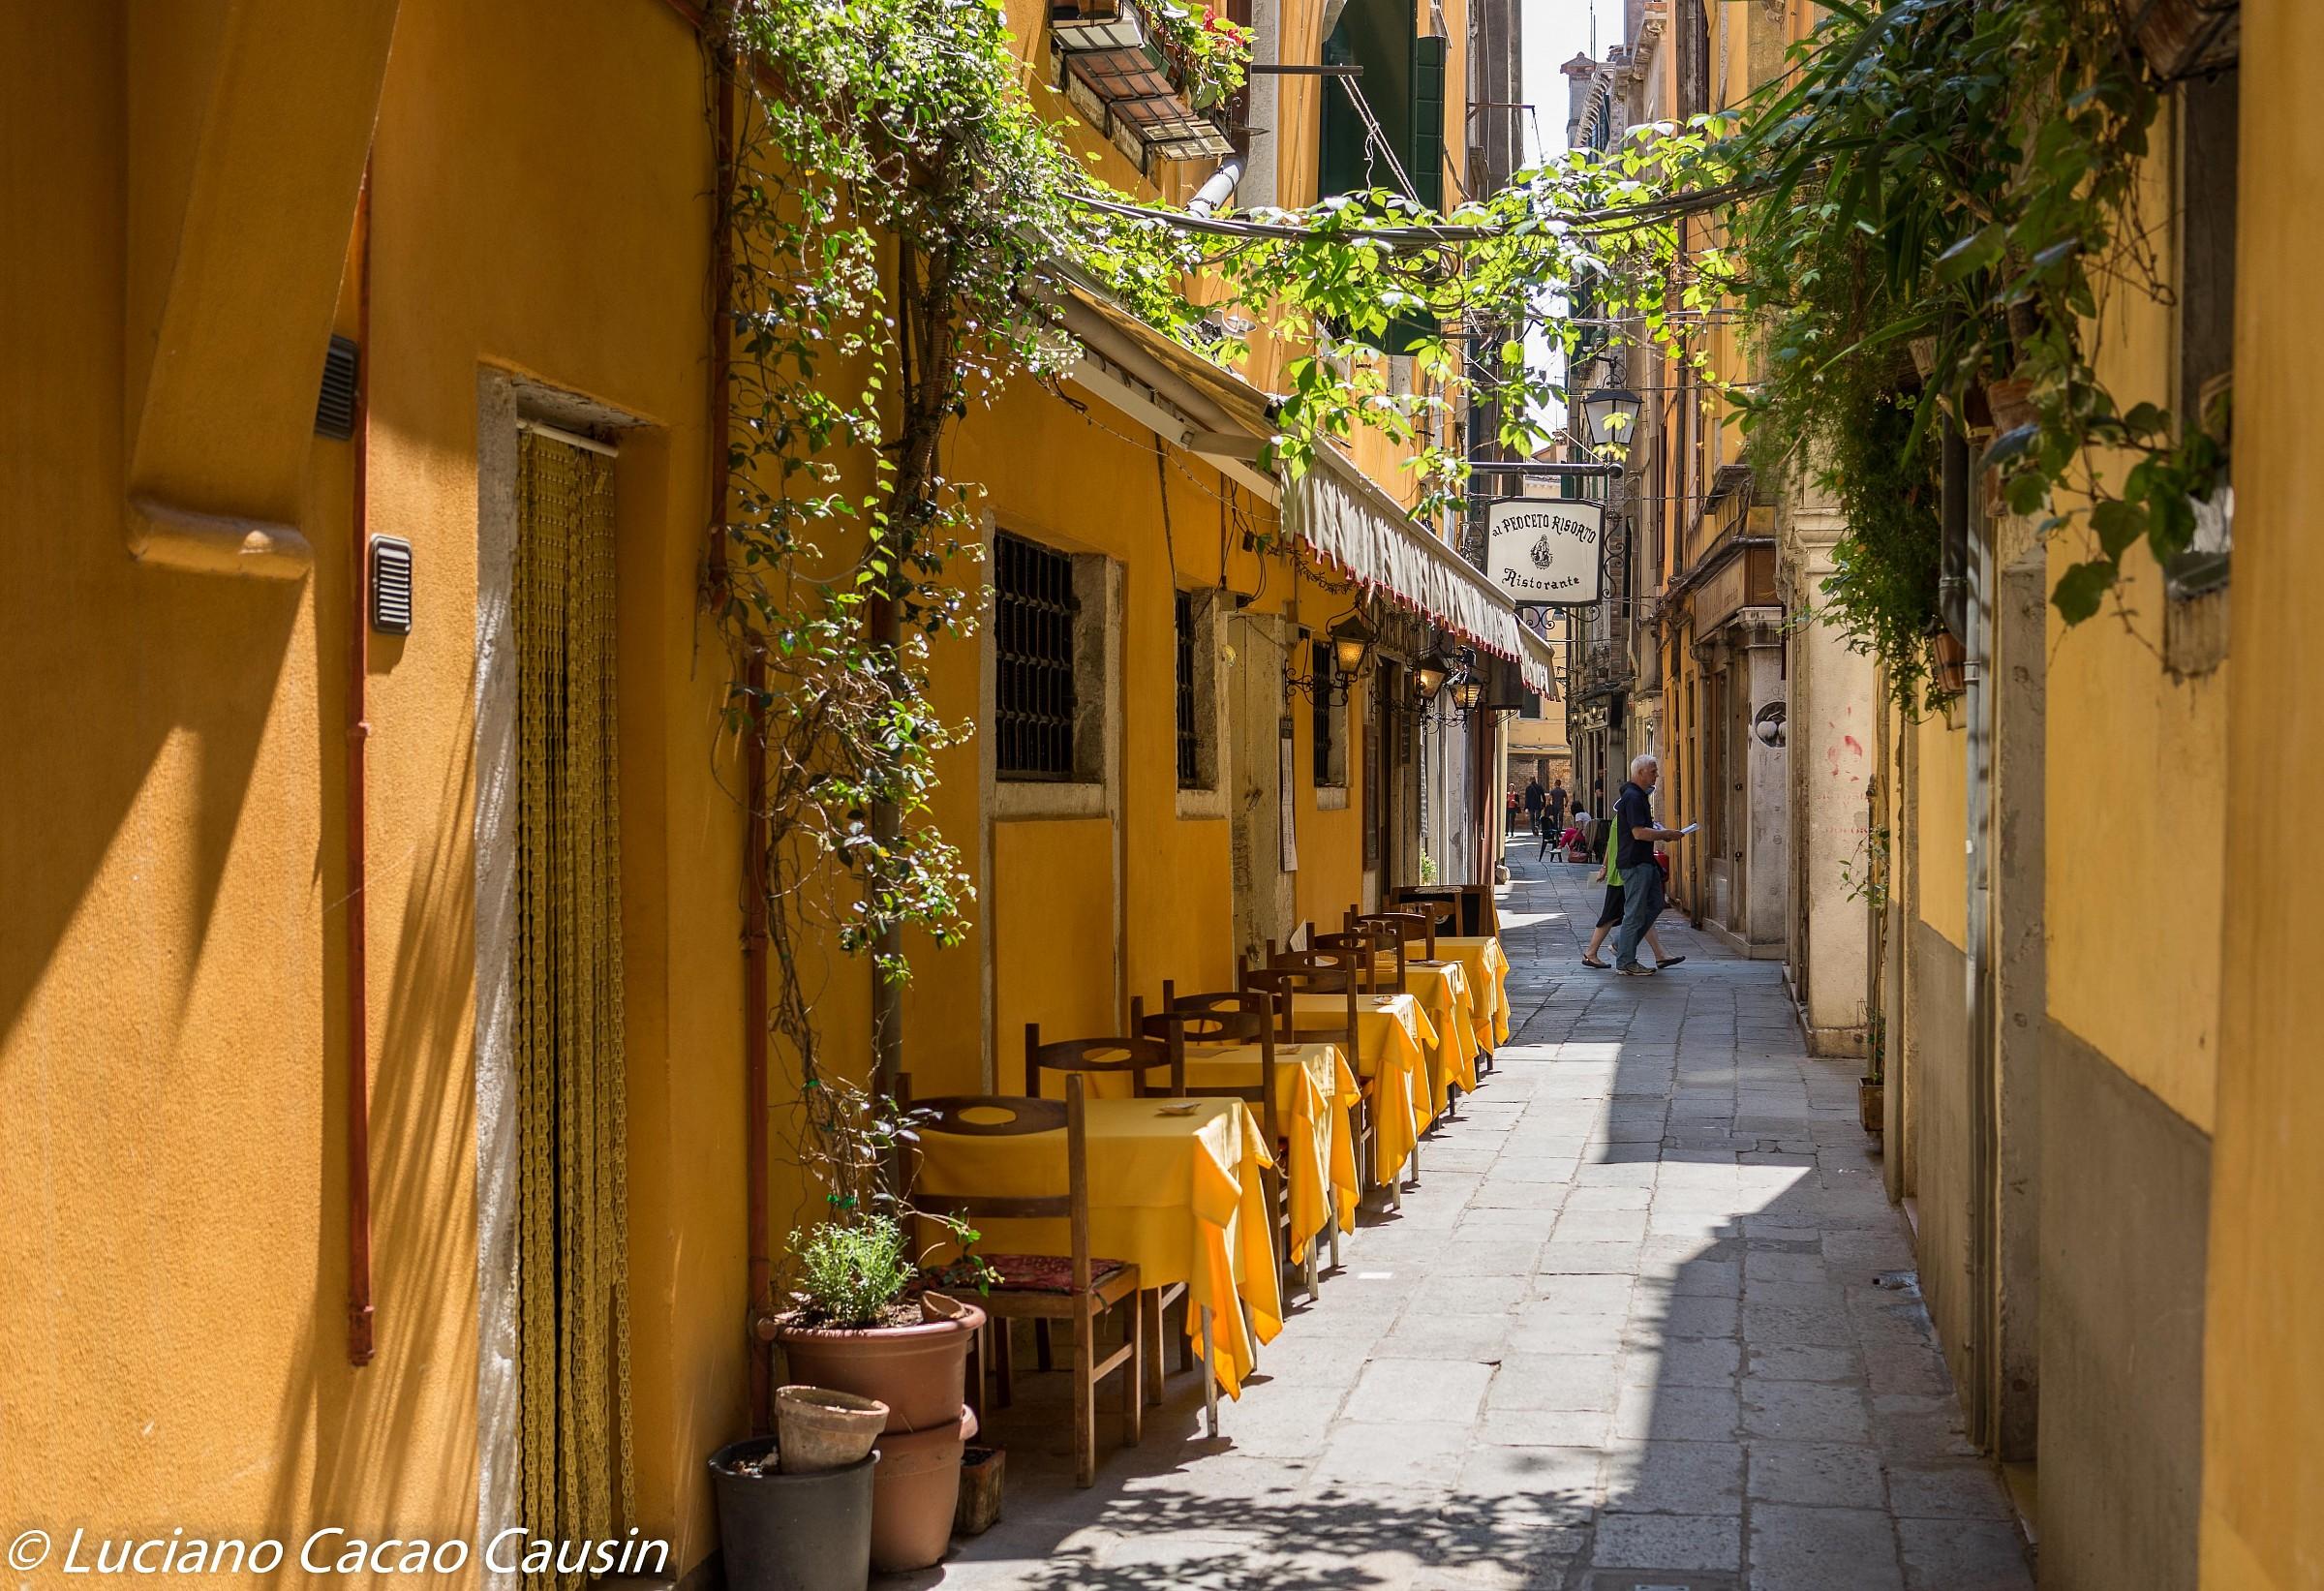 El Peoceto risen historic Venetian restaurant...